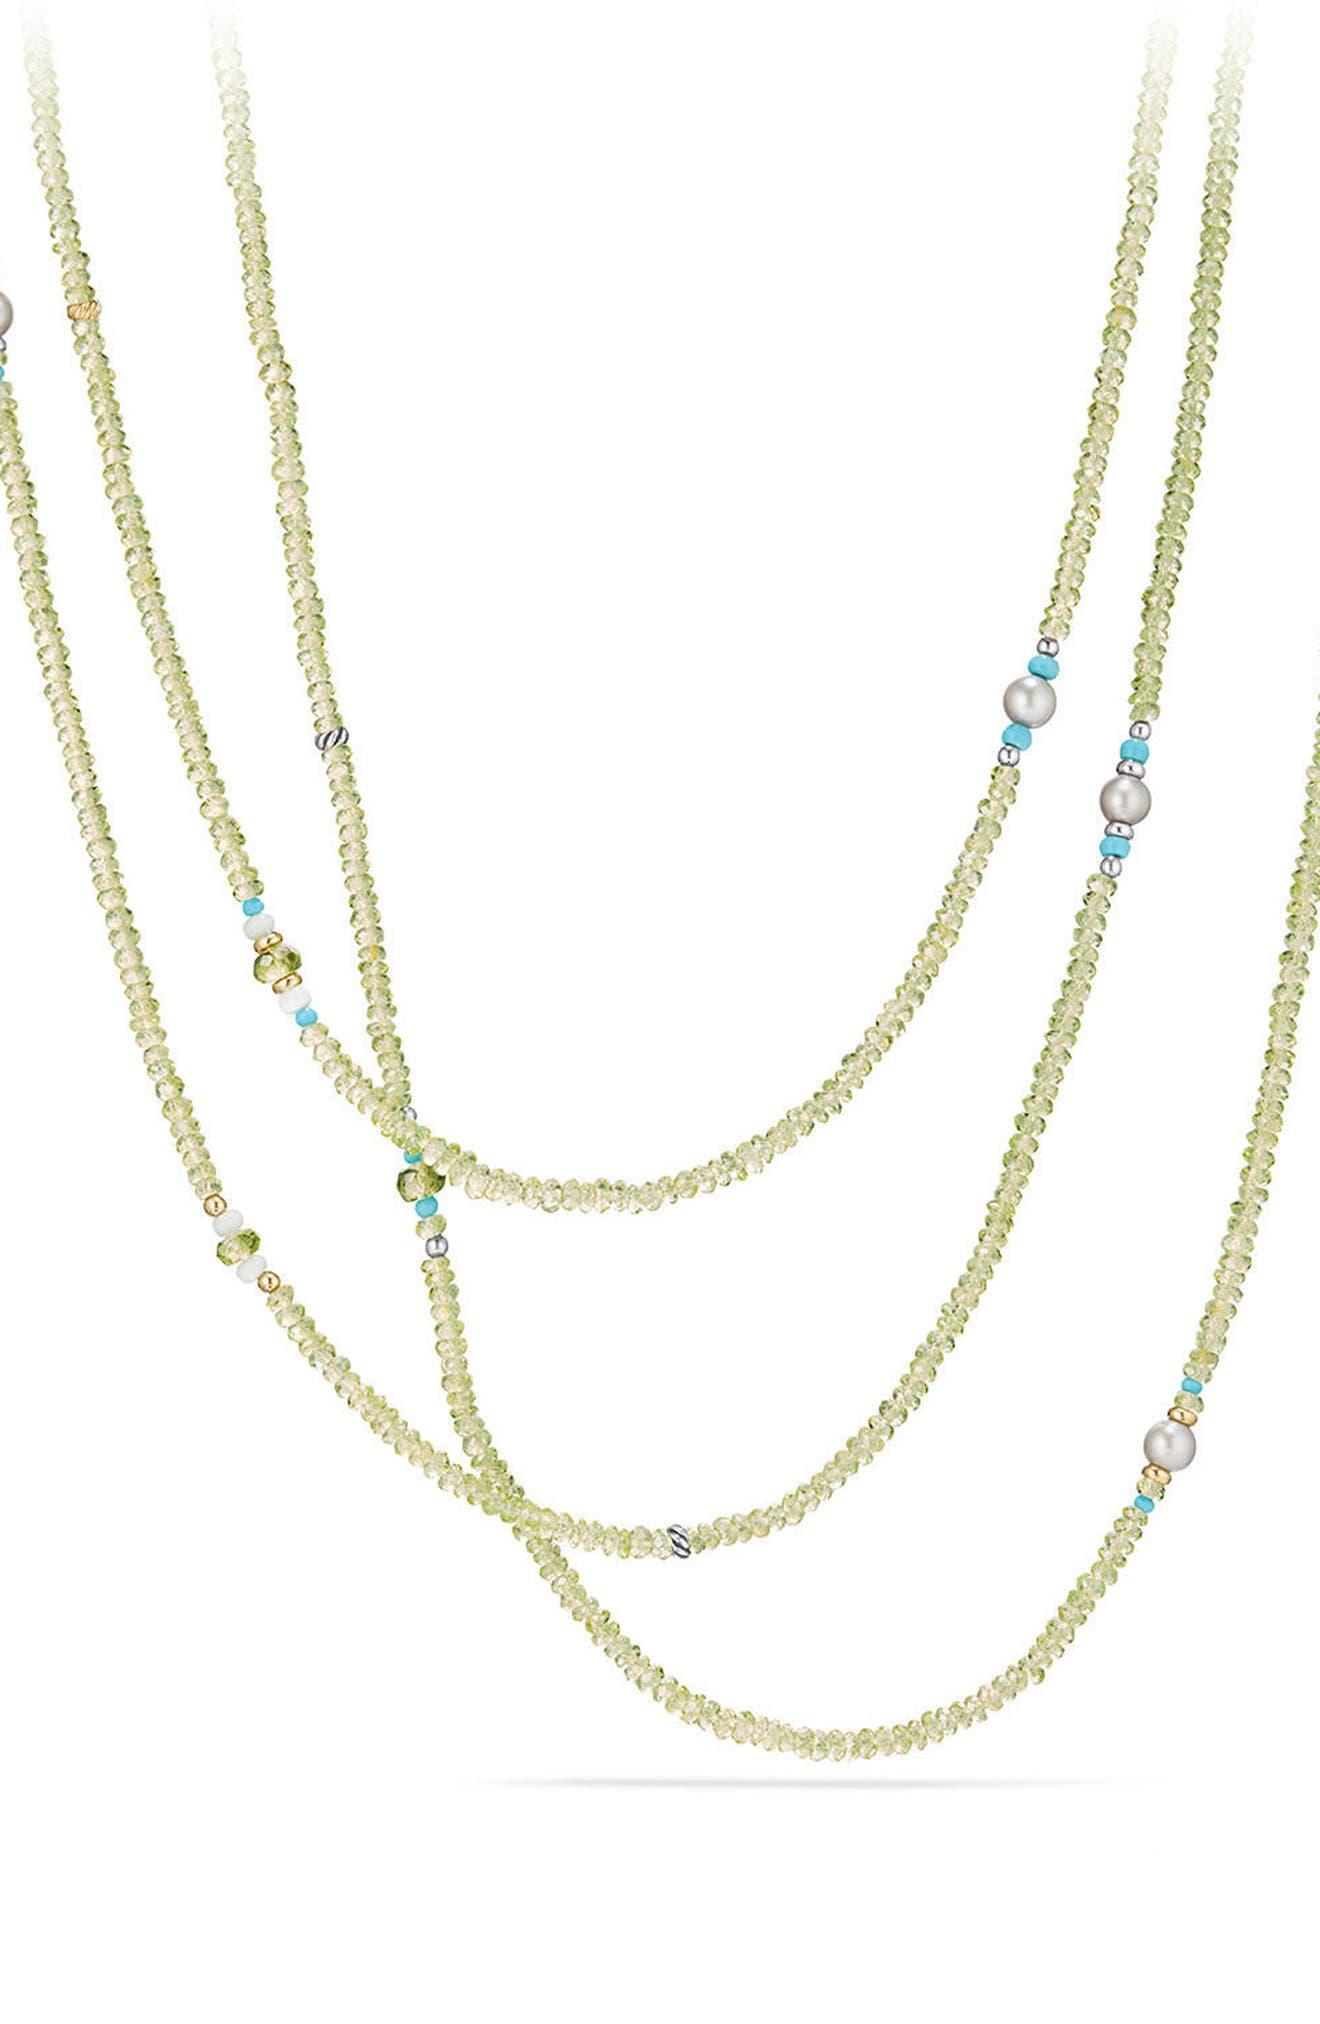 Mustique Tweejoux Beaded Necklace,                         Main,                         color, Silver/ Gold/ Multi